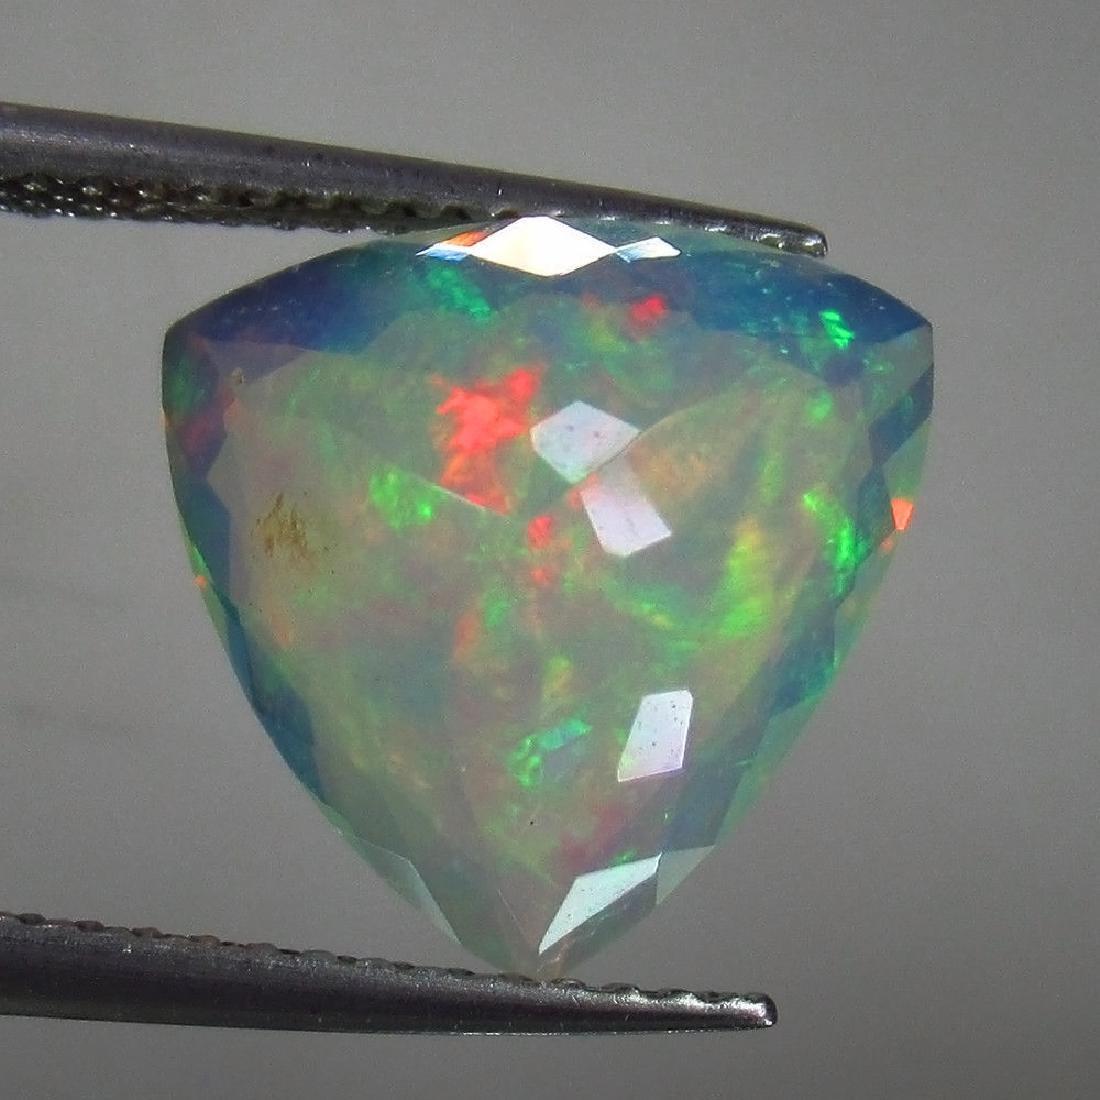 3.15 Ctw Natural Ethiopian Faceted Opal Rare Trillion - 2